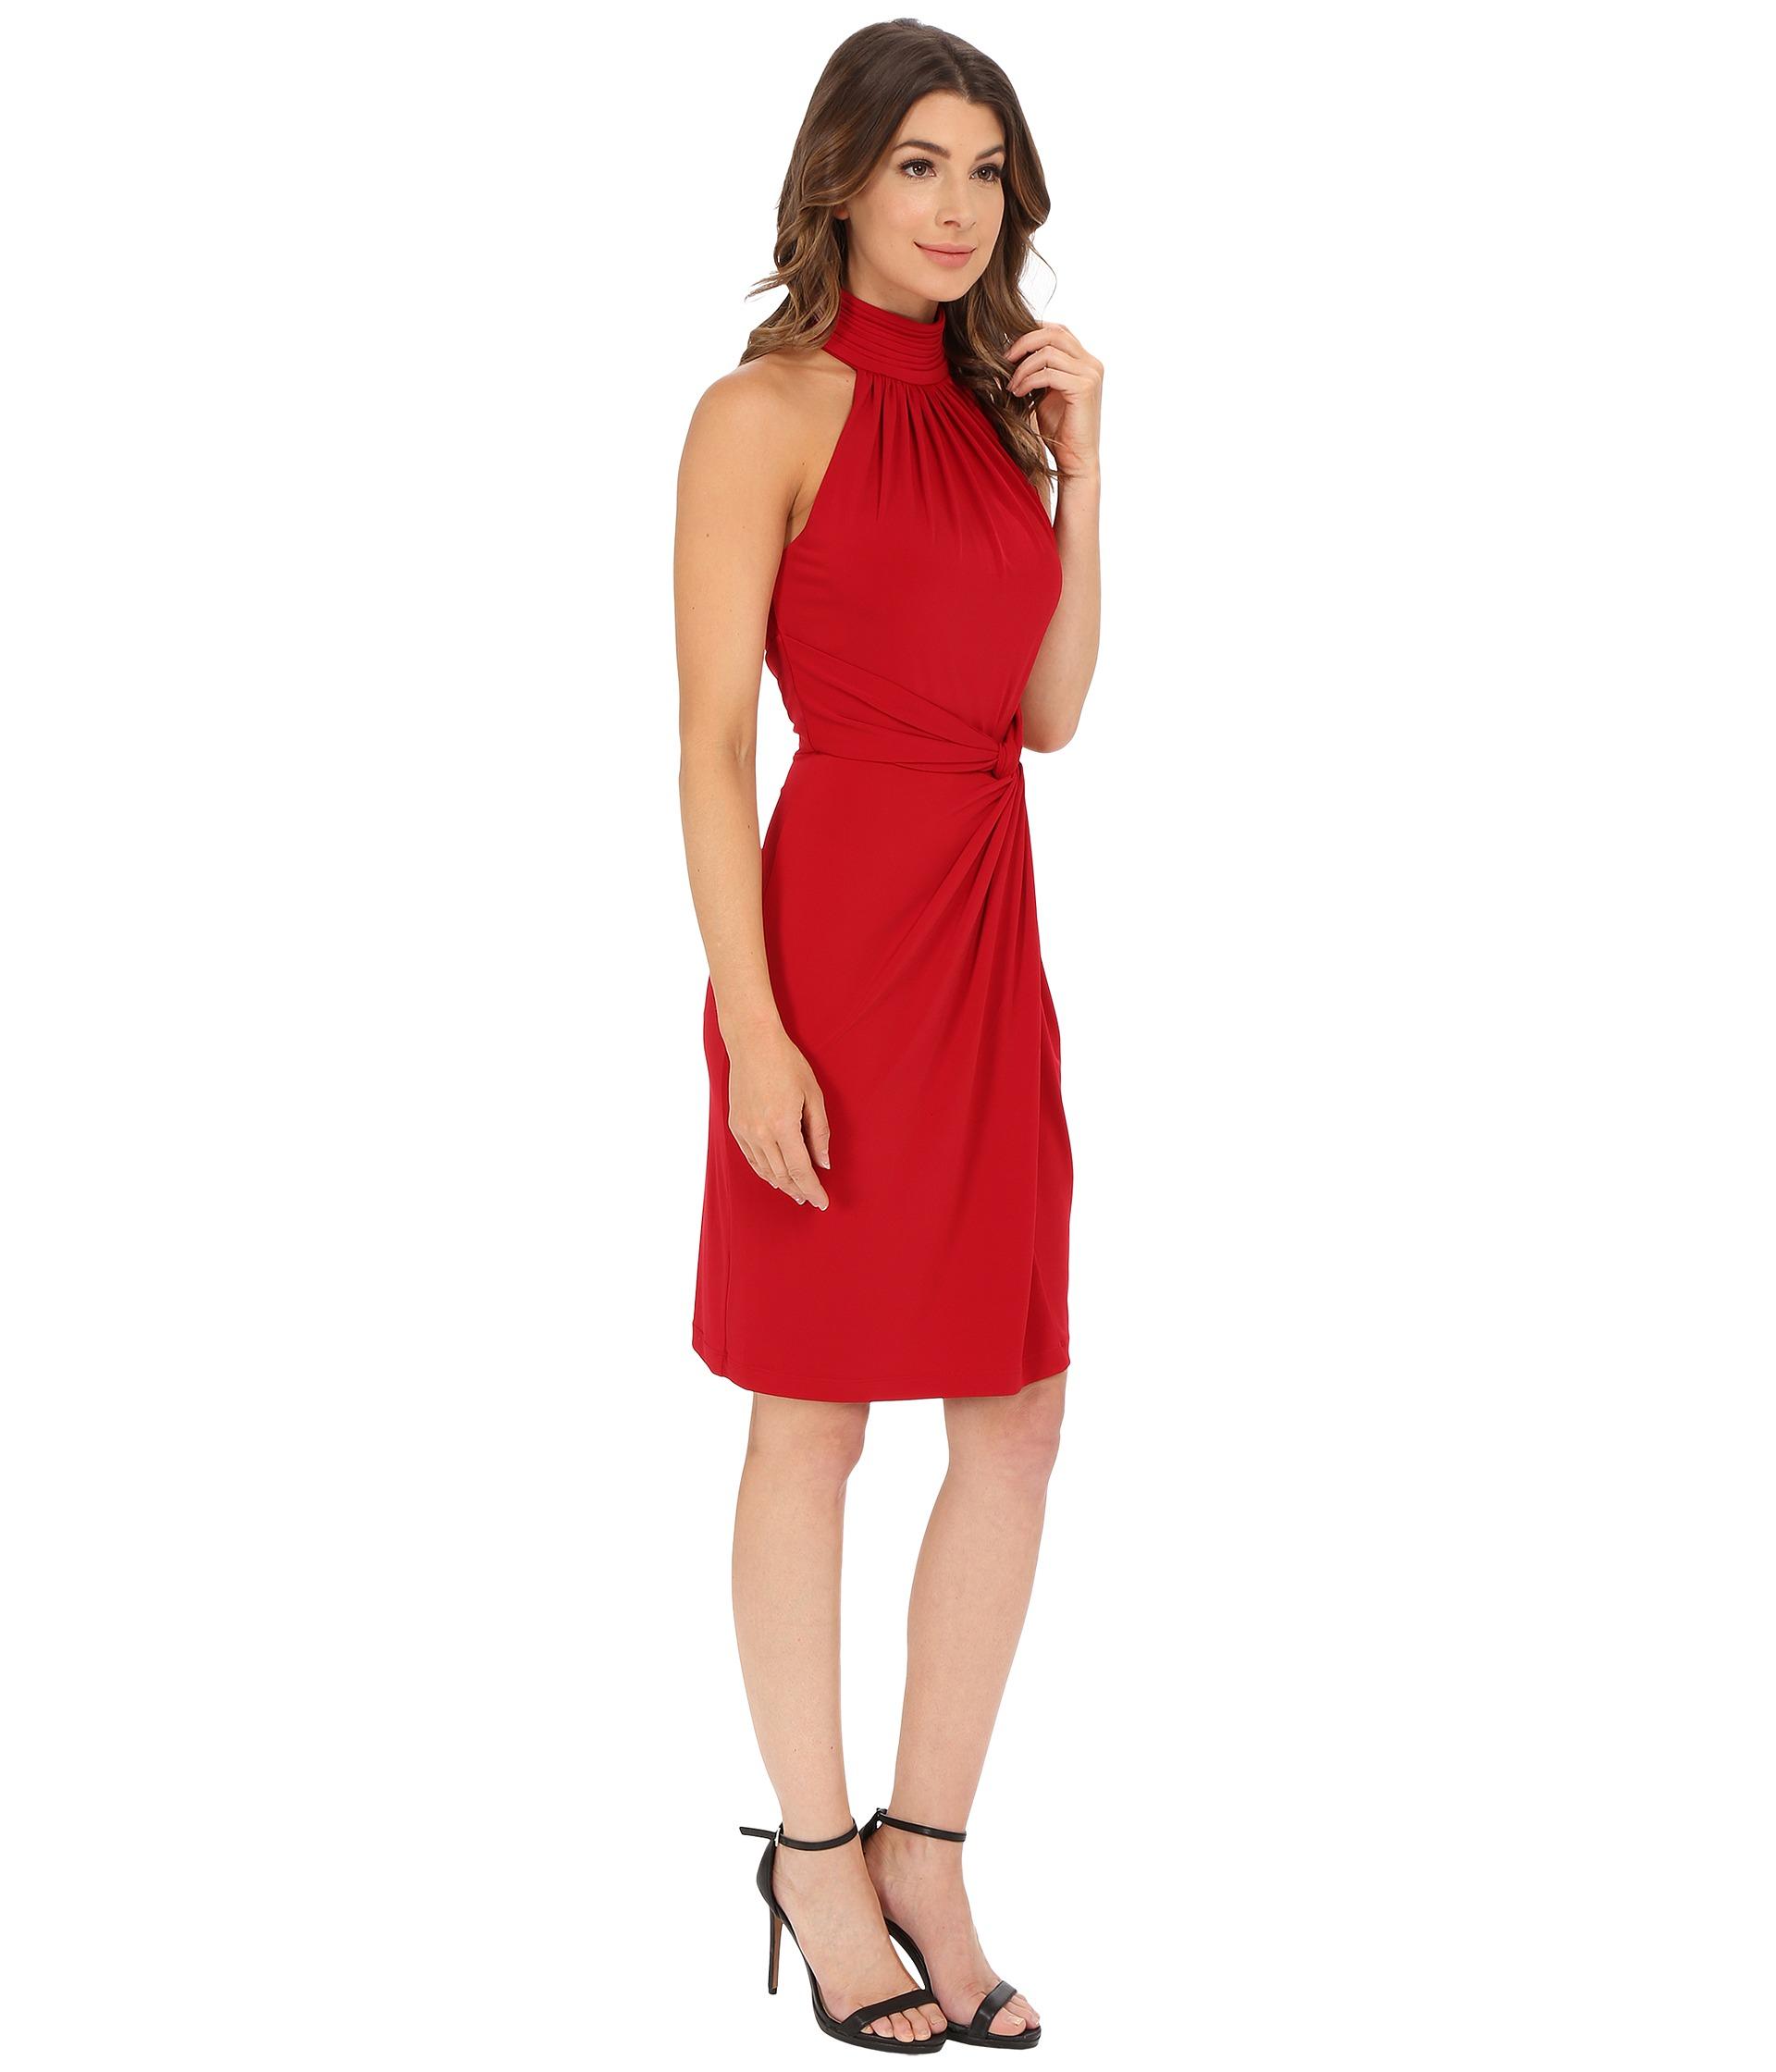 Lyst - Catherine Malandrino Jazz Dress in Red